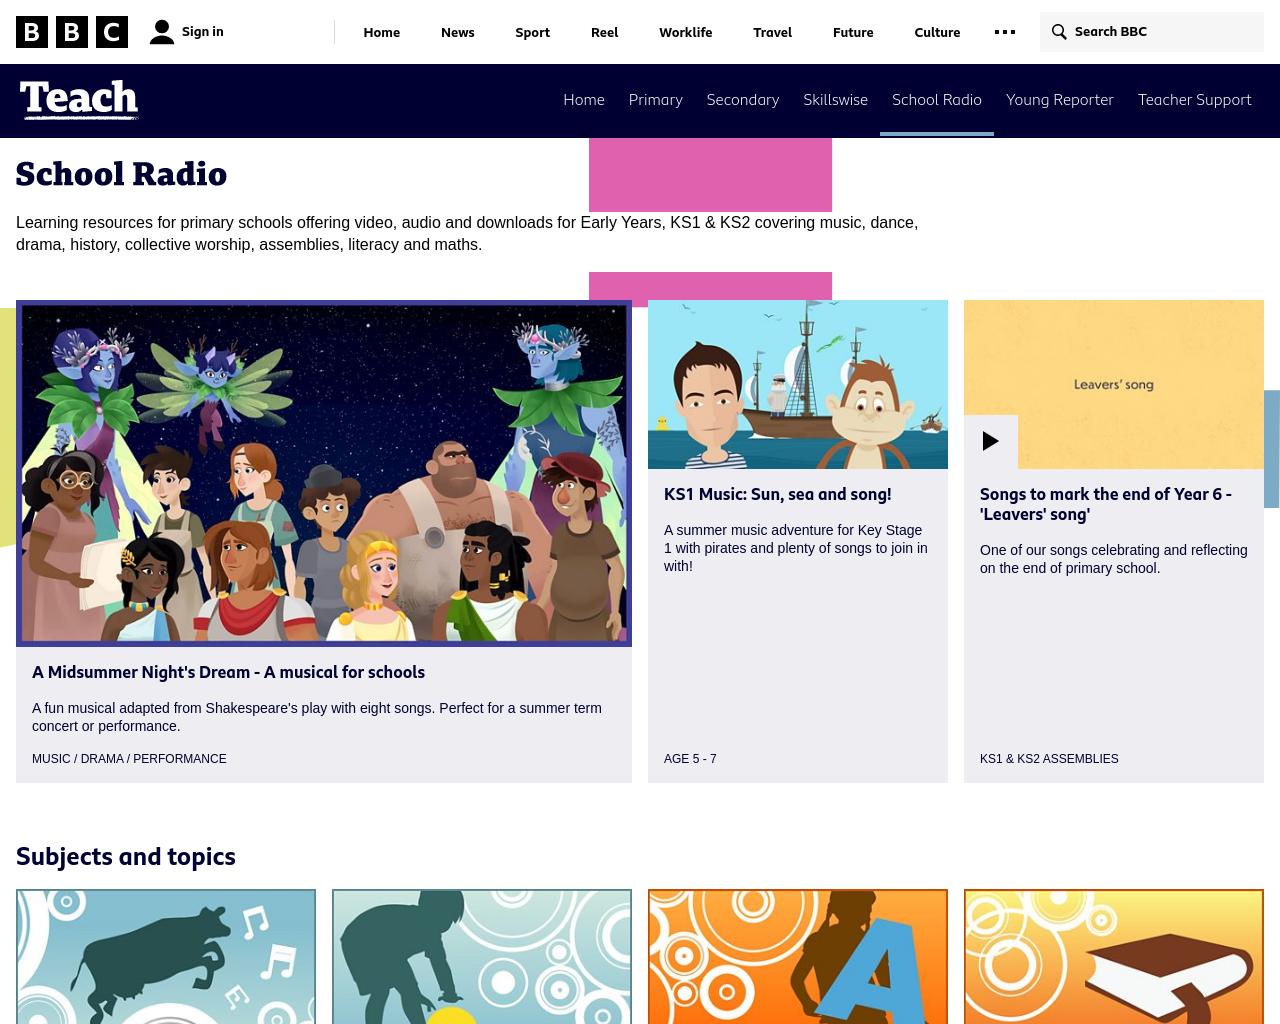 BBC School Radio